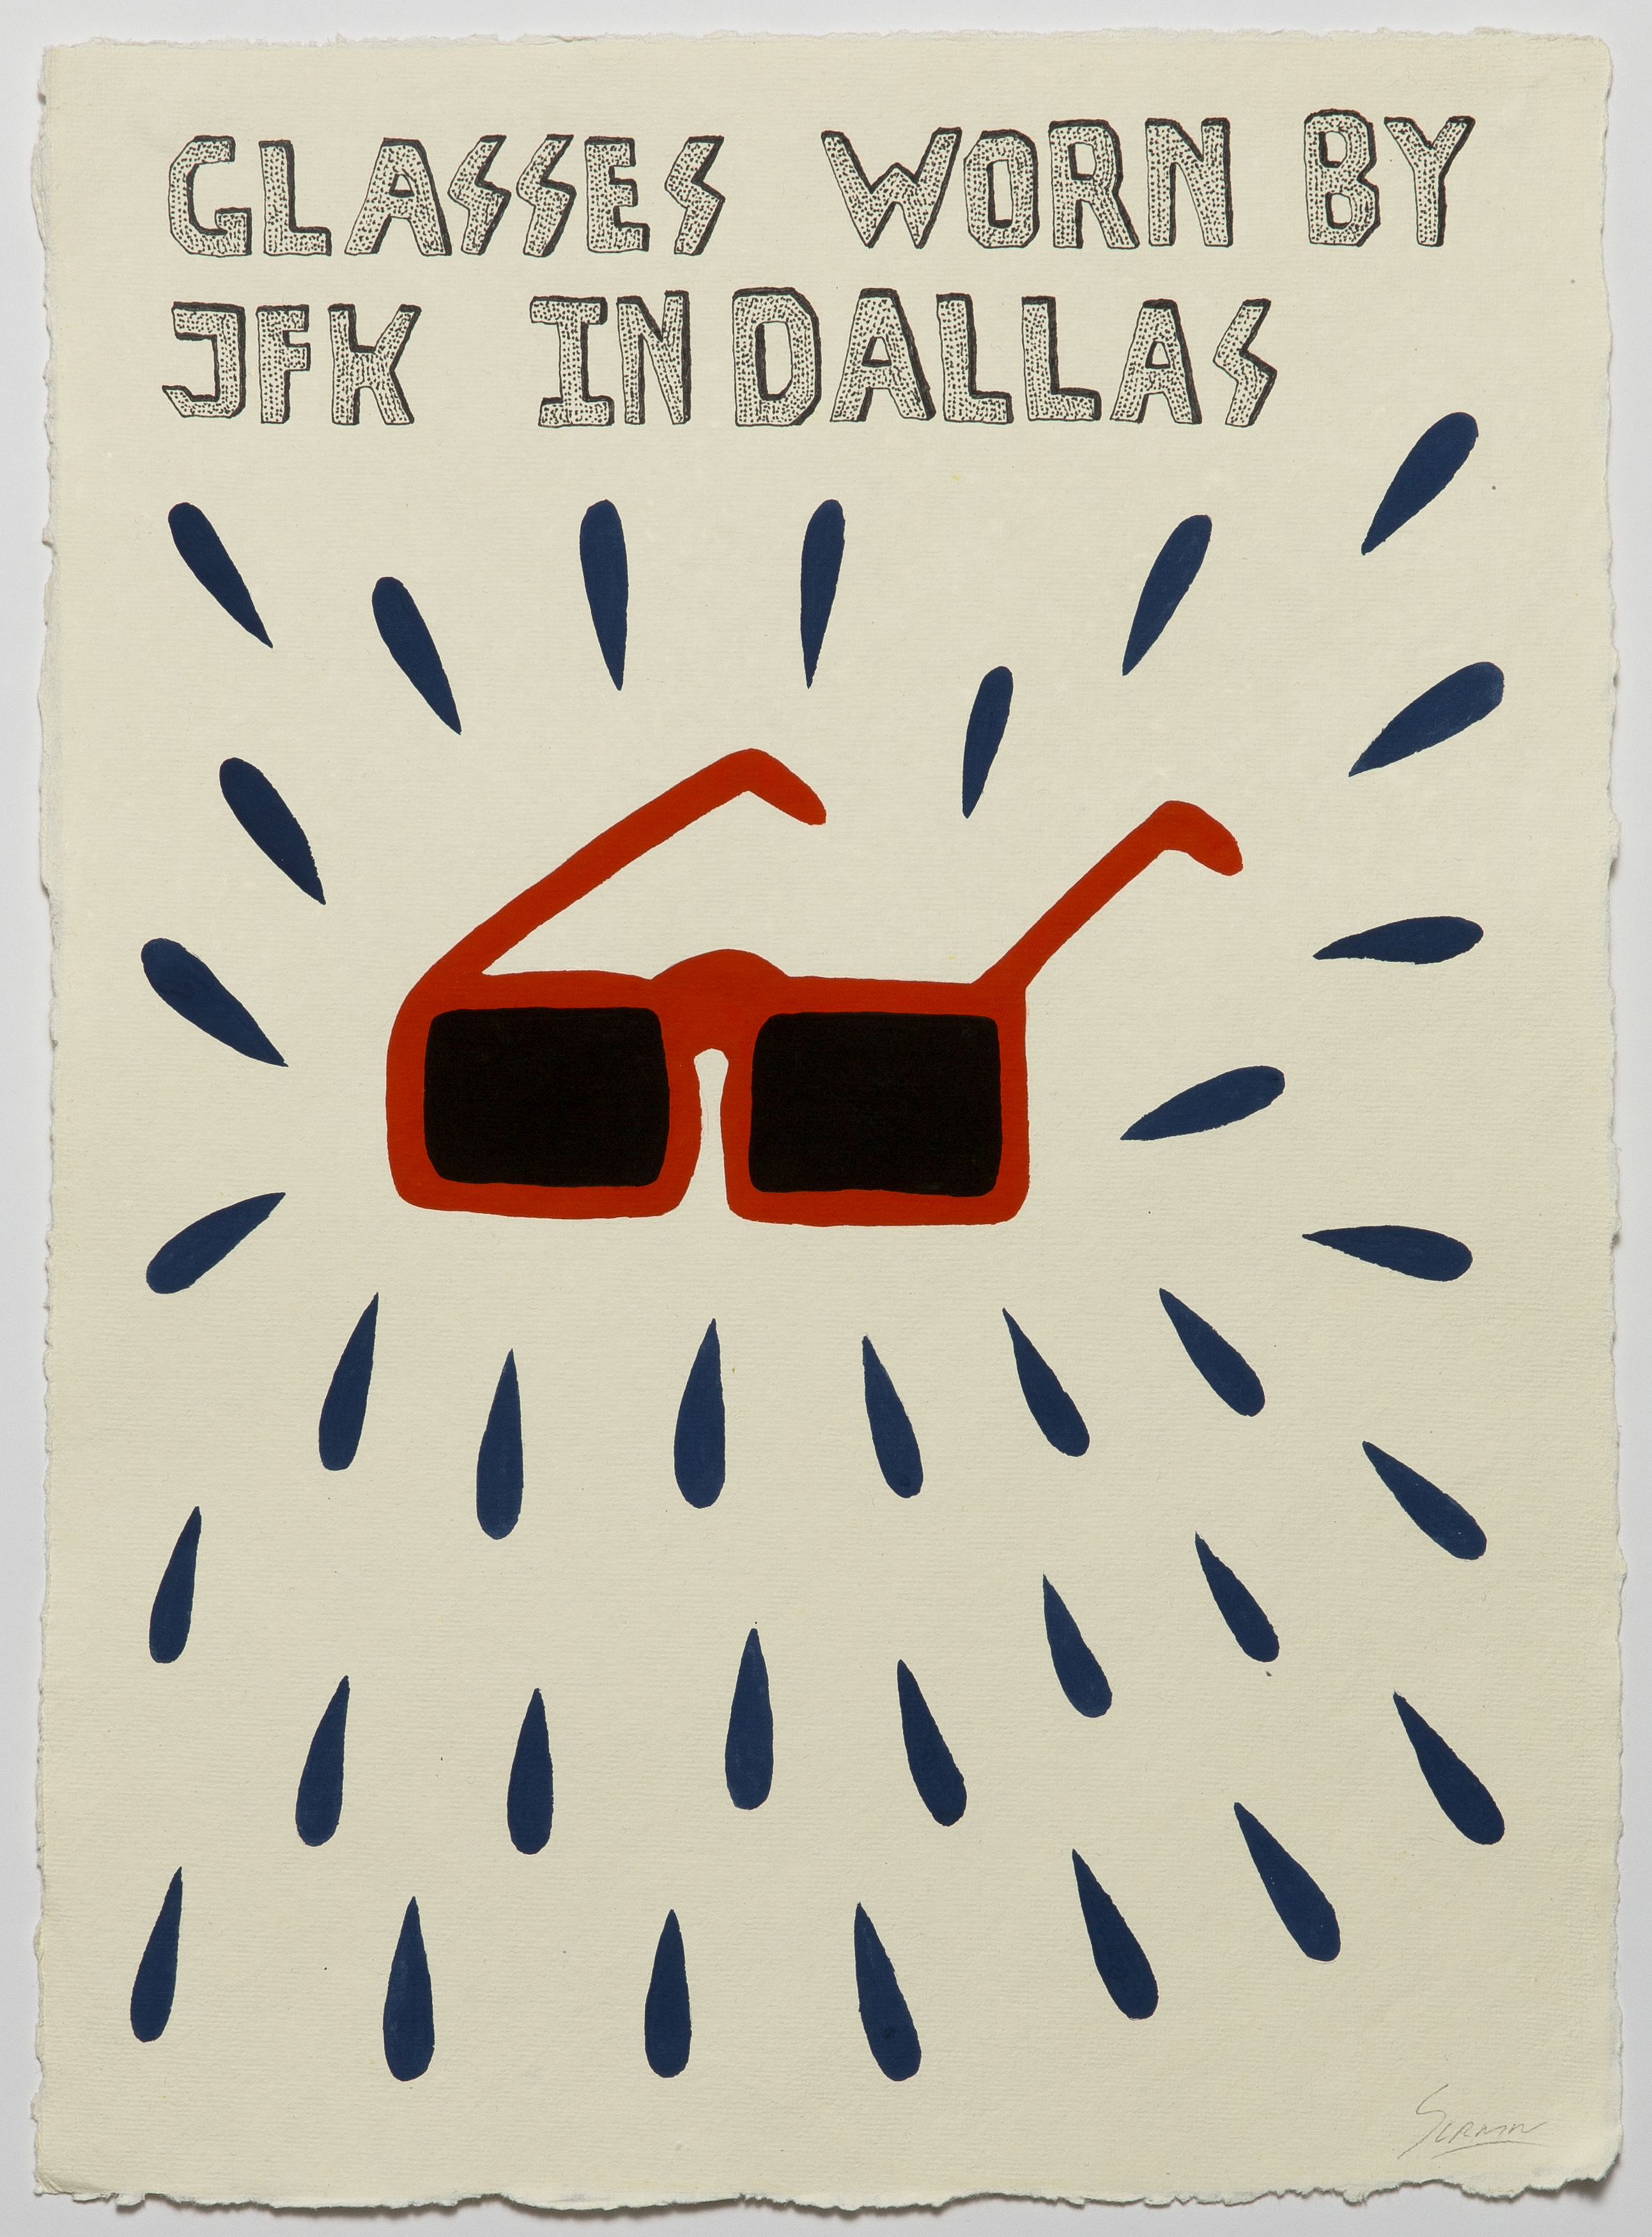 Glasses Worn By JFK in Dallas